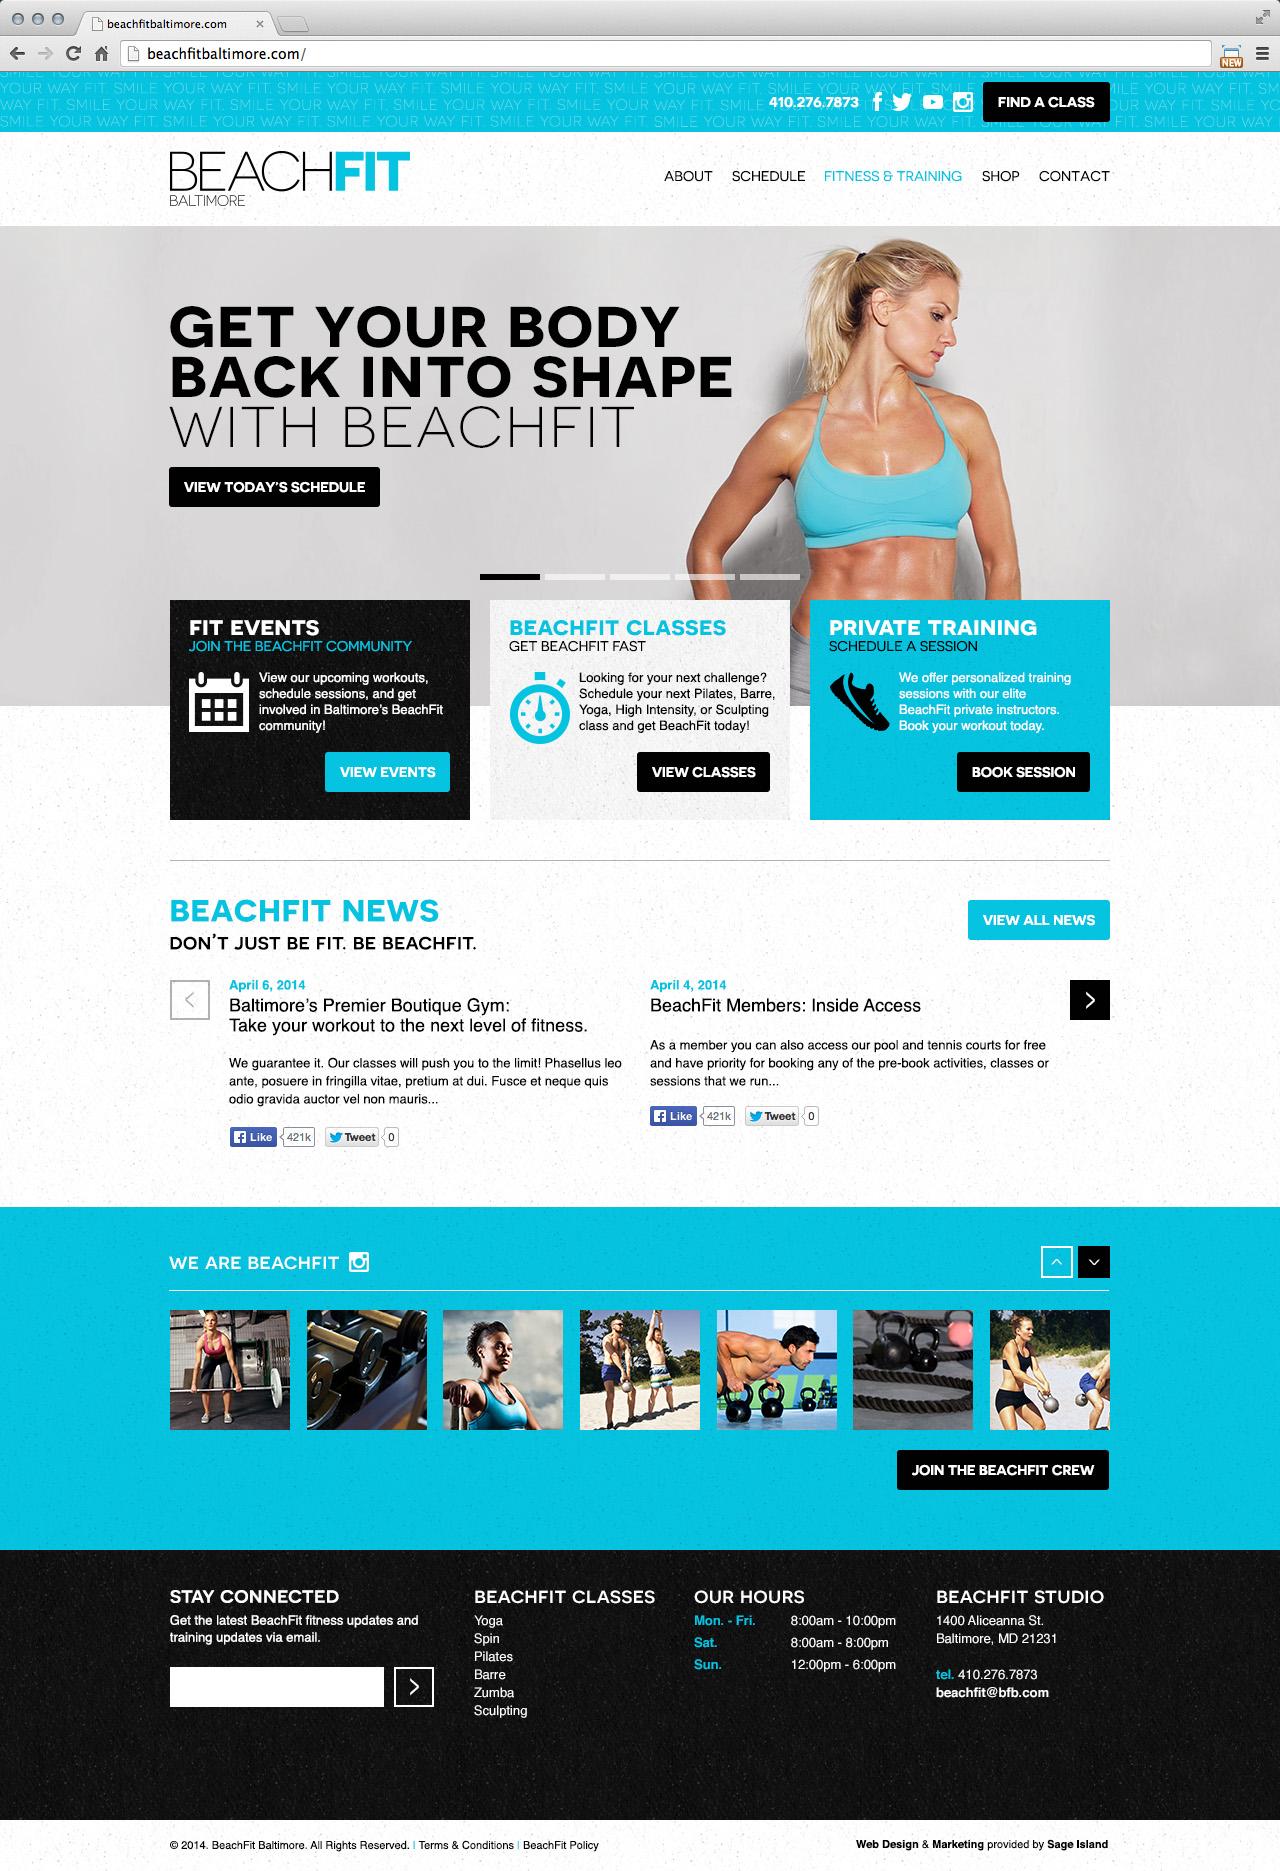 beachfit-baltimore-boutique-fitness-studio-website-design